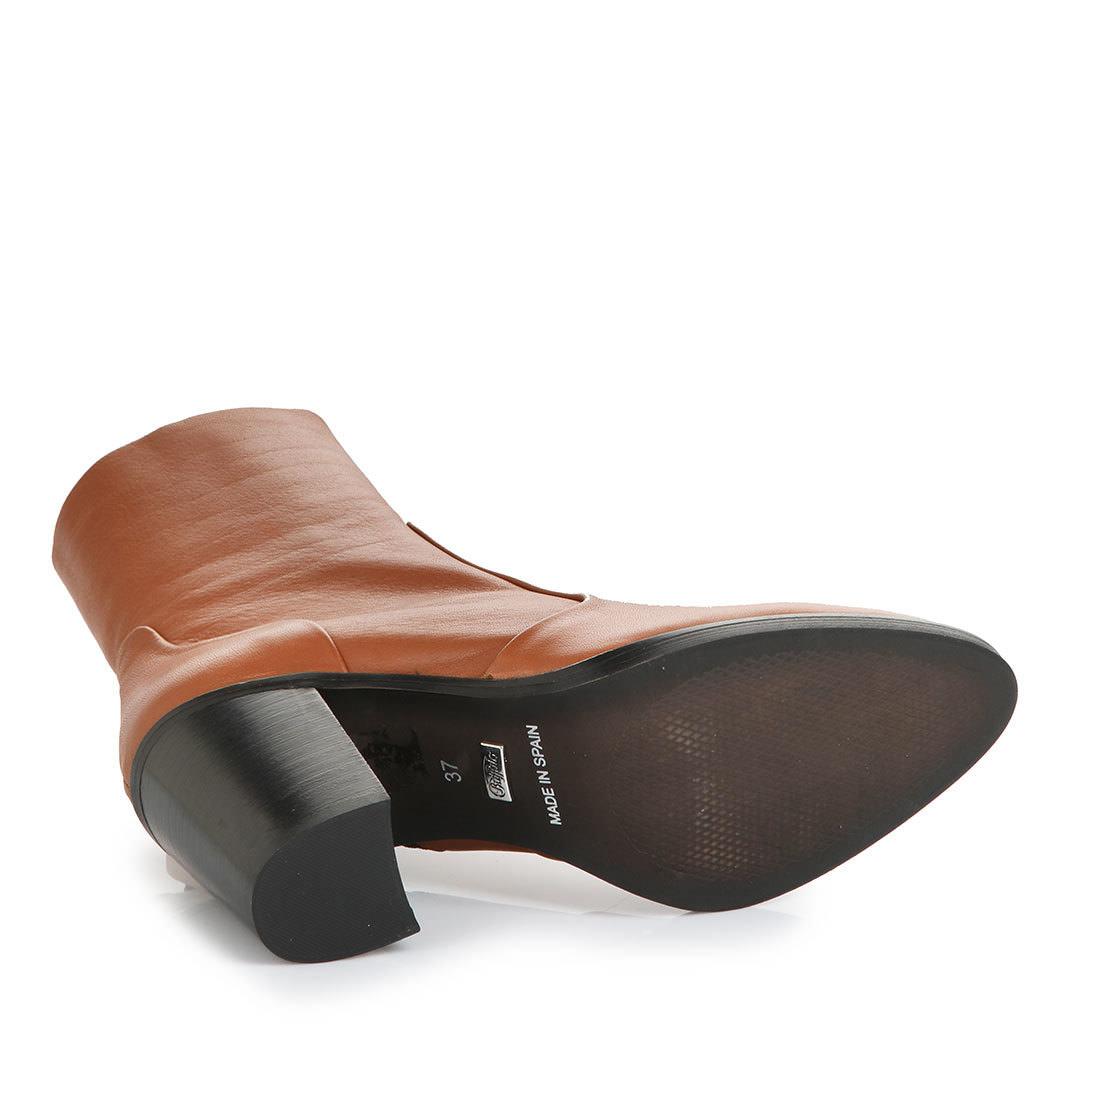 huge selection of bdb38 e3632 Buffalo slim-leg ankle boots in cognac buy online in BUFFALO ...